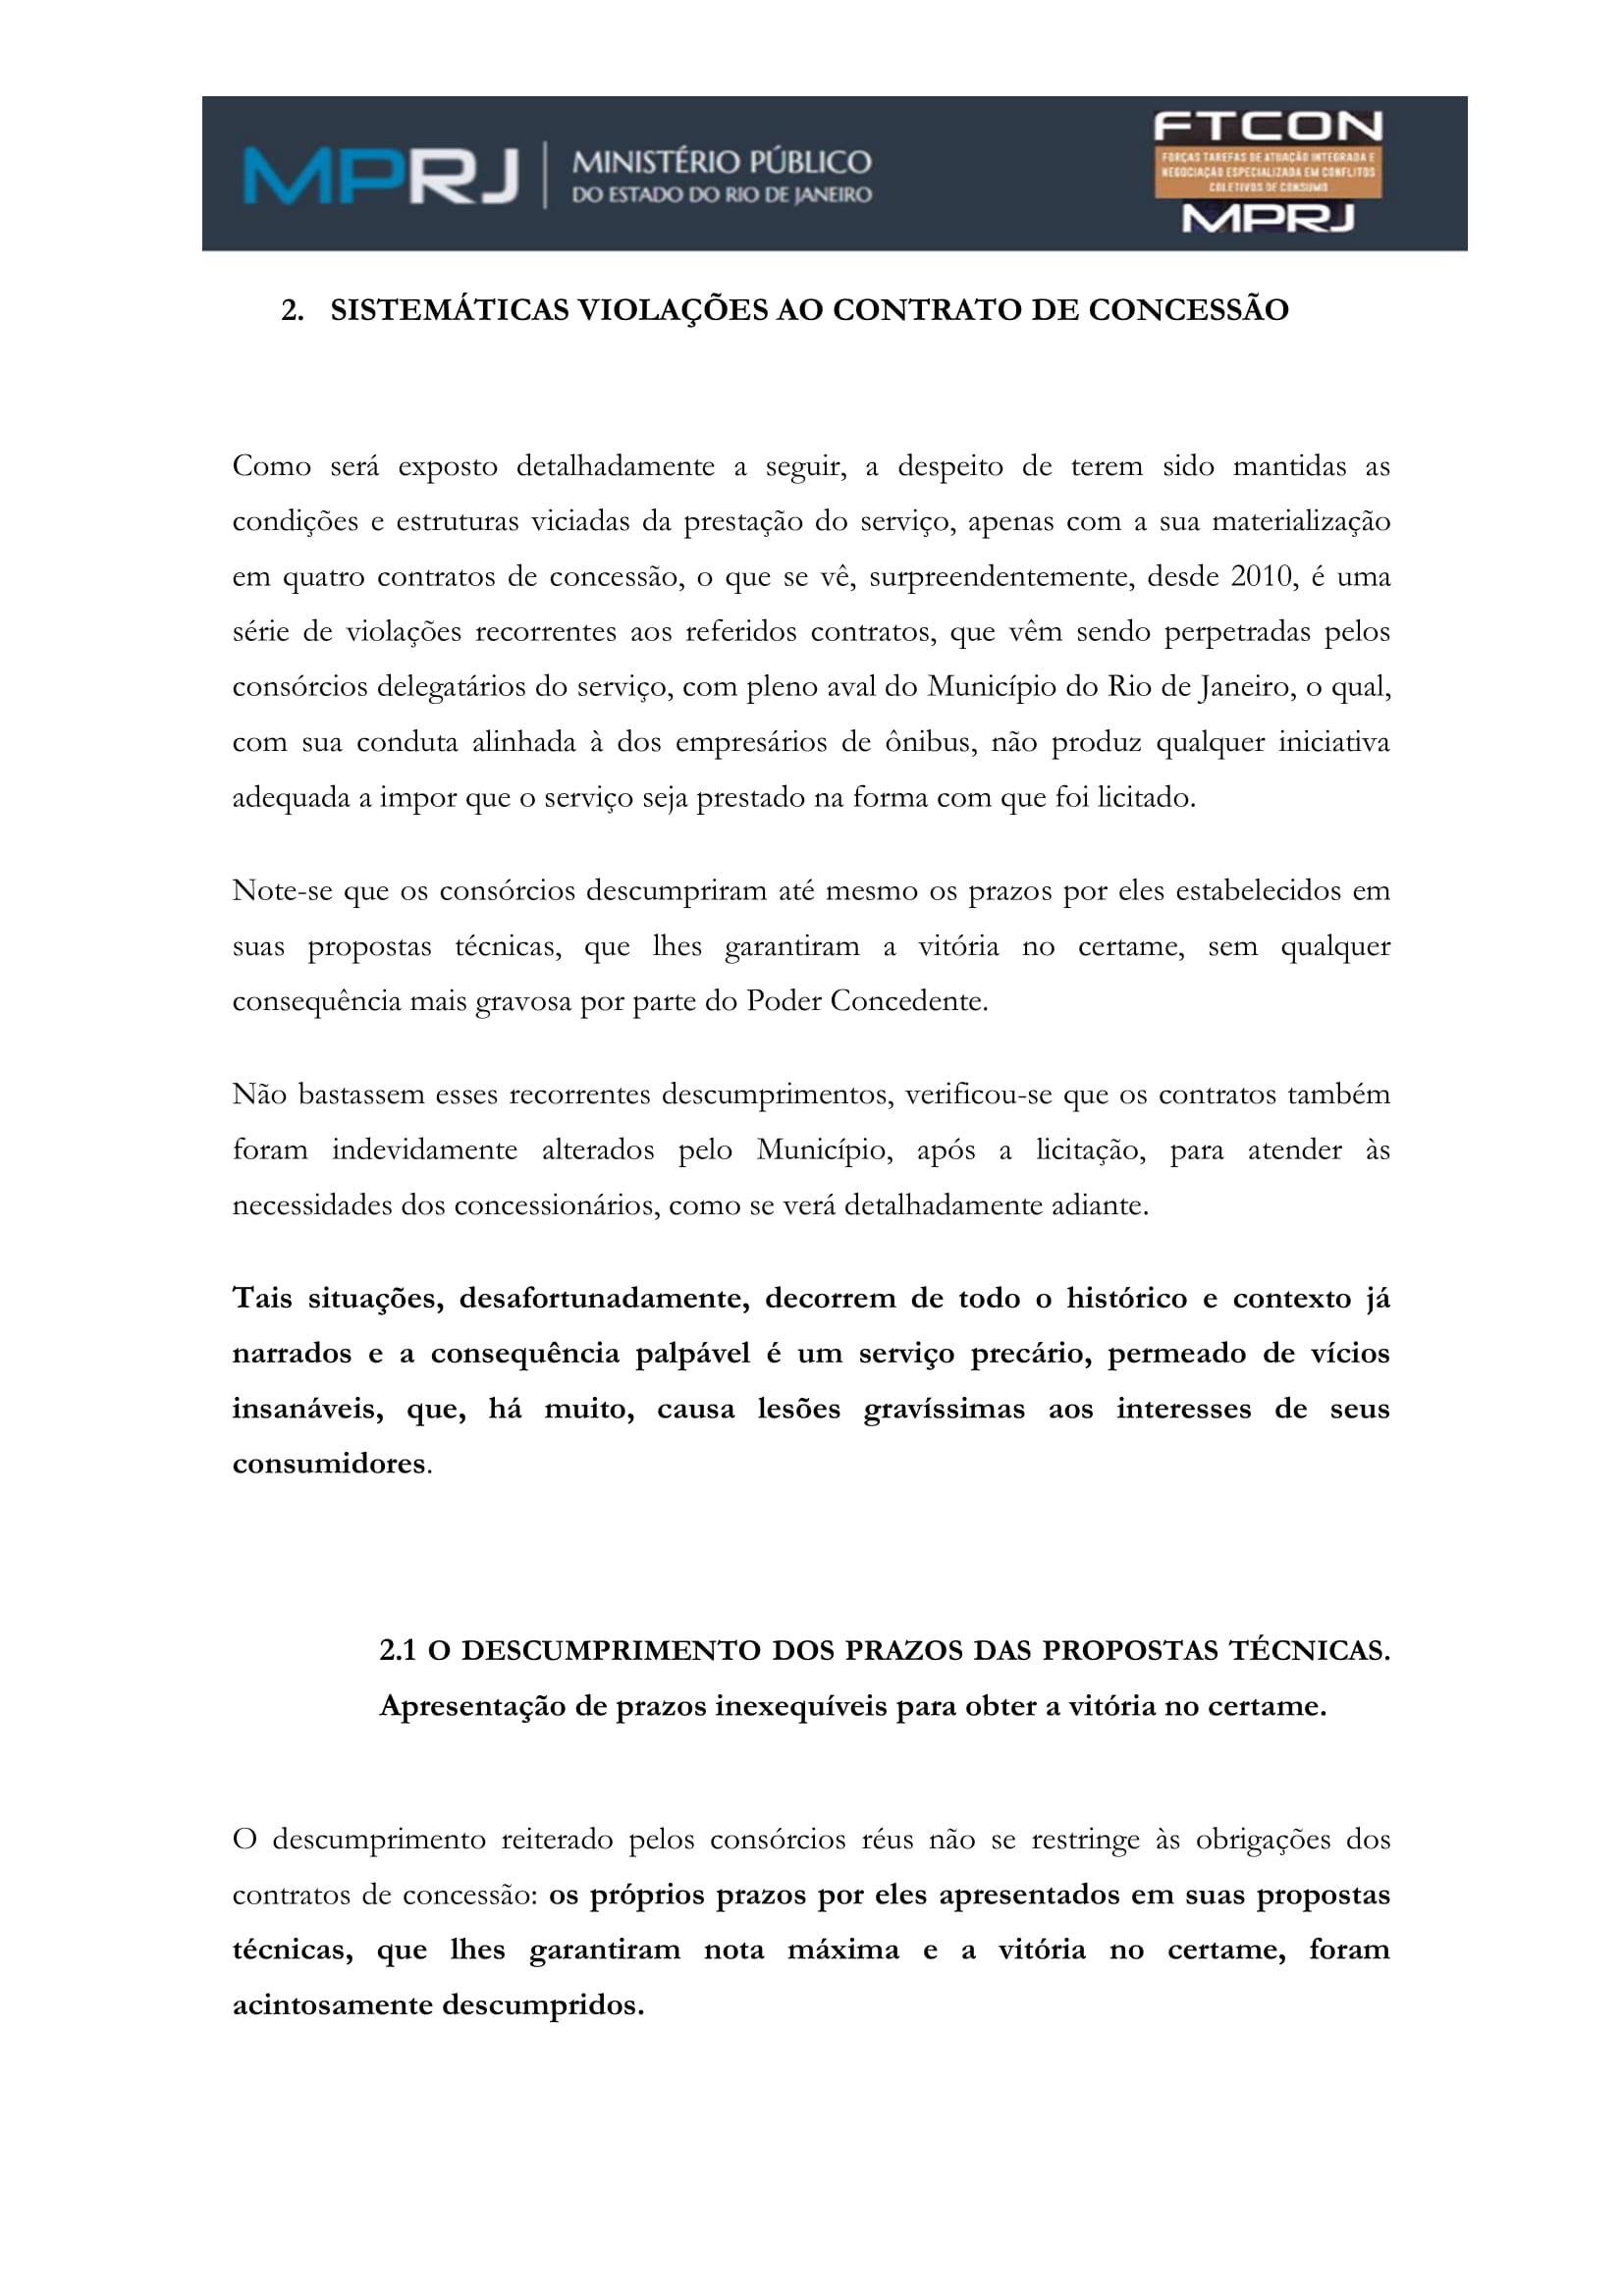 acp_caducidade_onibus_dr_rt-018